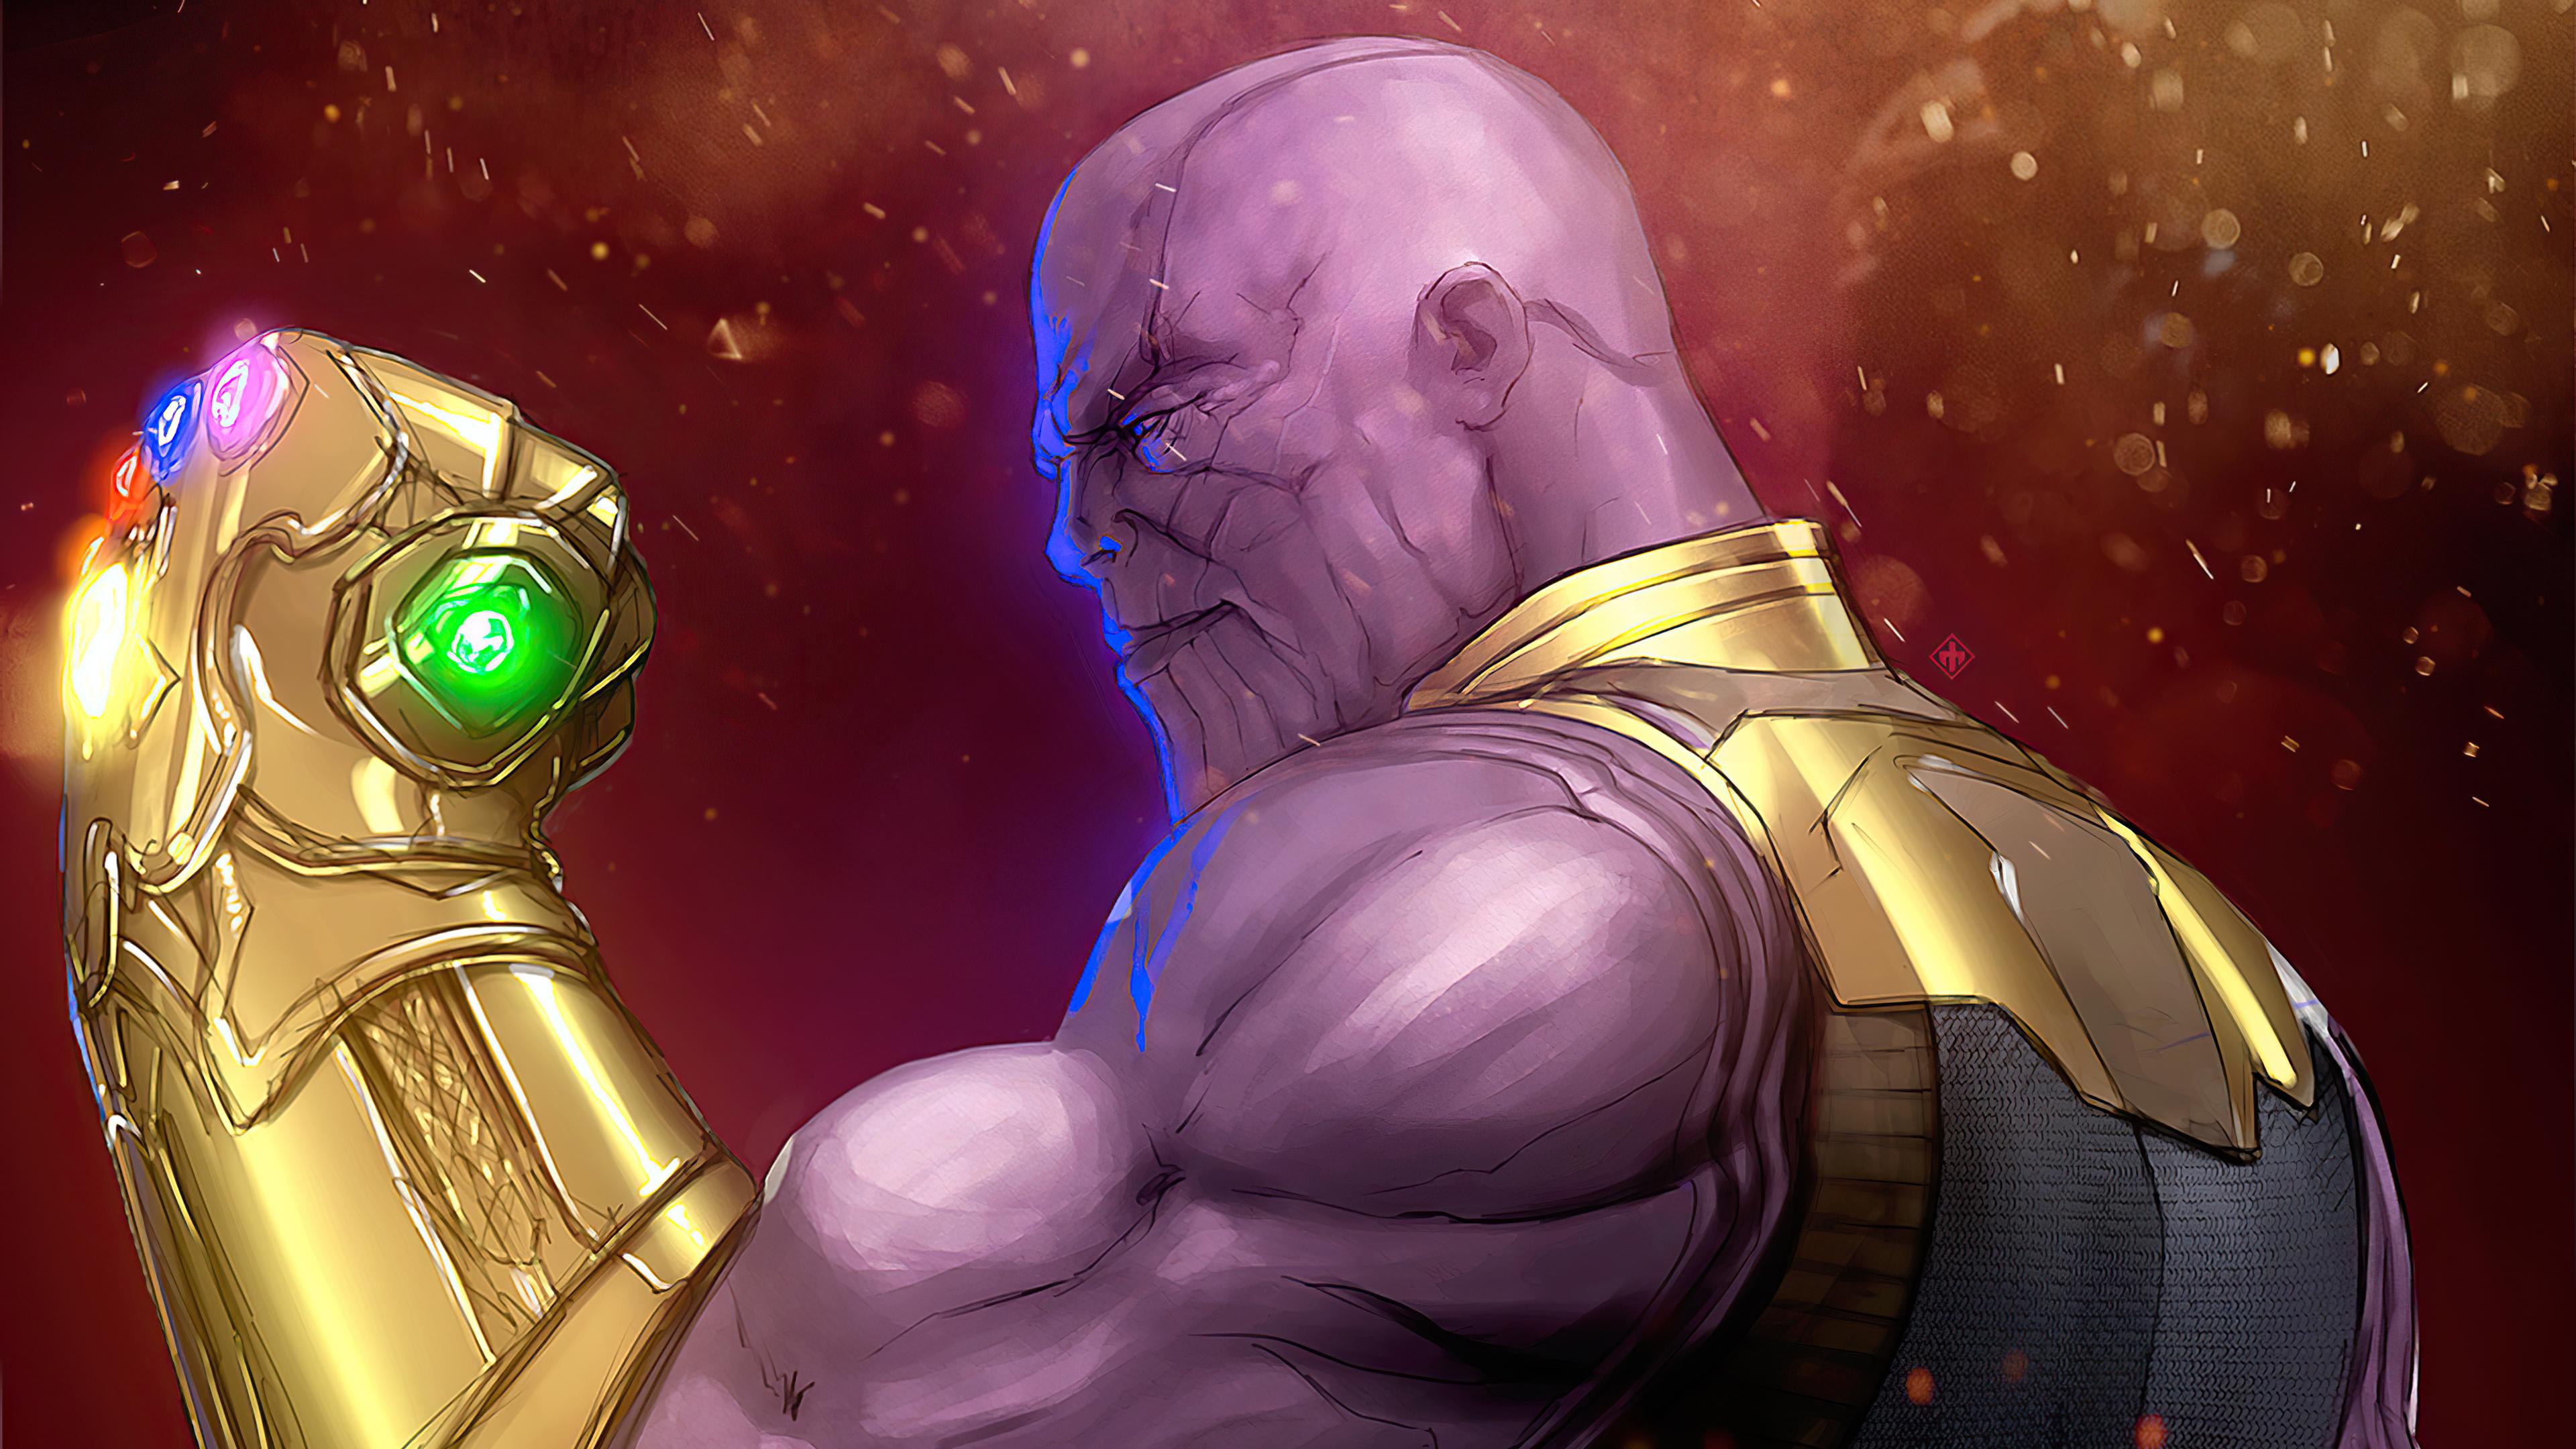 thanos snap 2020 4k 1604347921 - Thanos Snap 2020 4k - Thanos Snap 2020 4k wallpapers